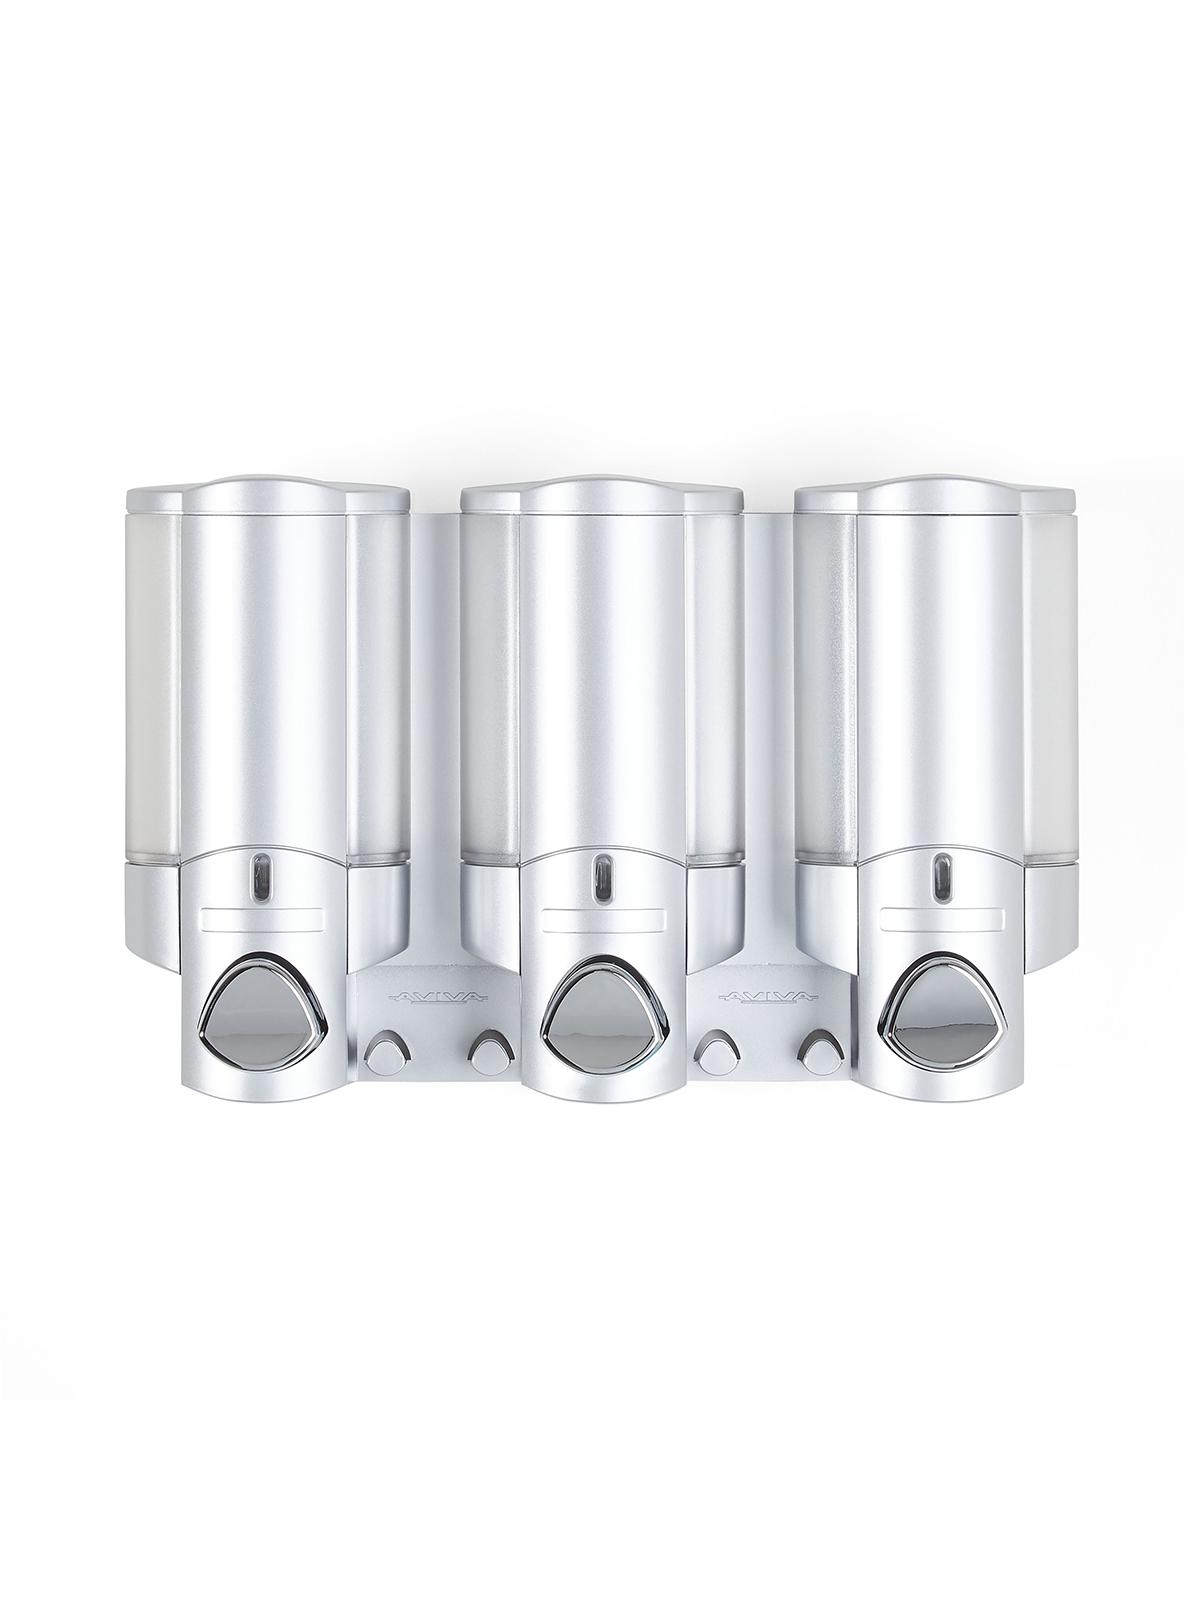 Диспенсер для жидкого мыла AVIVA трехкамерный 325мл